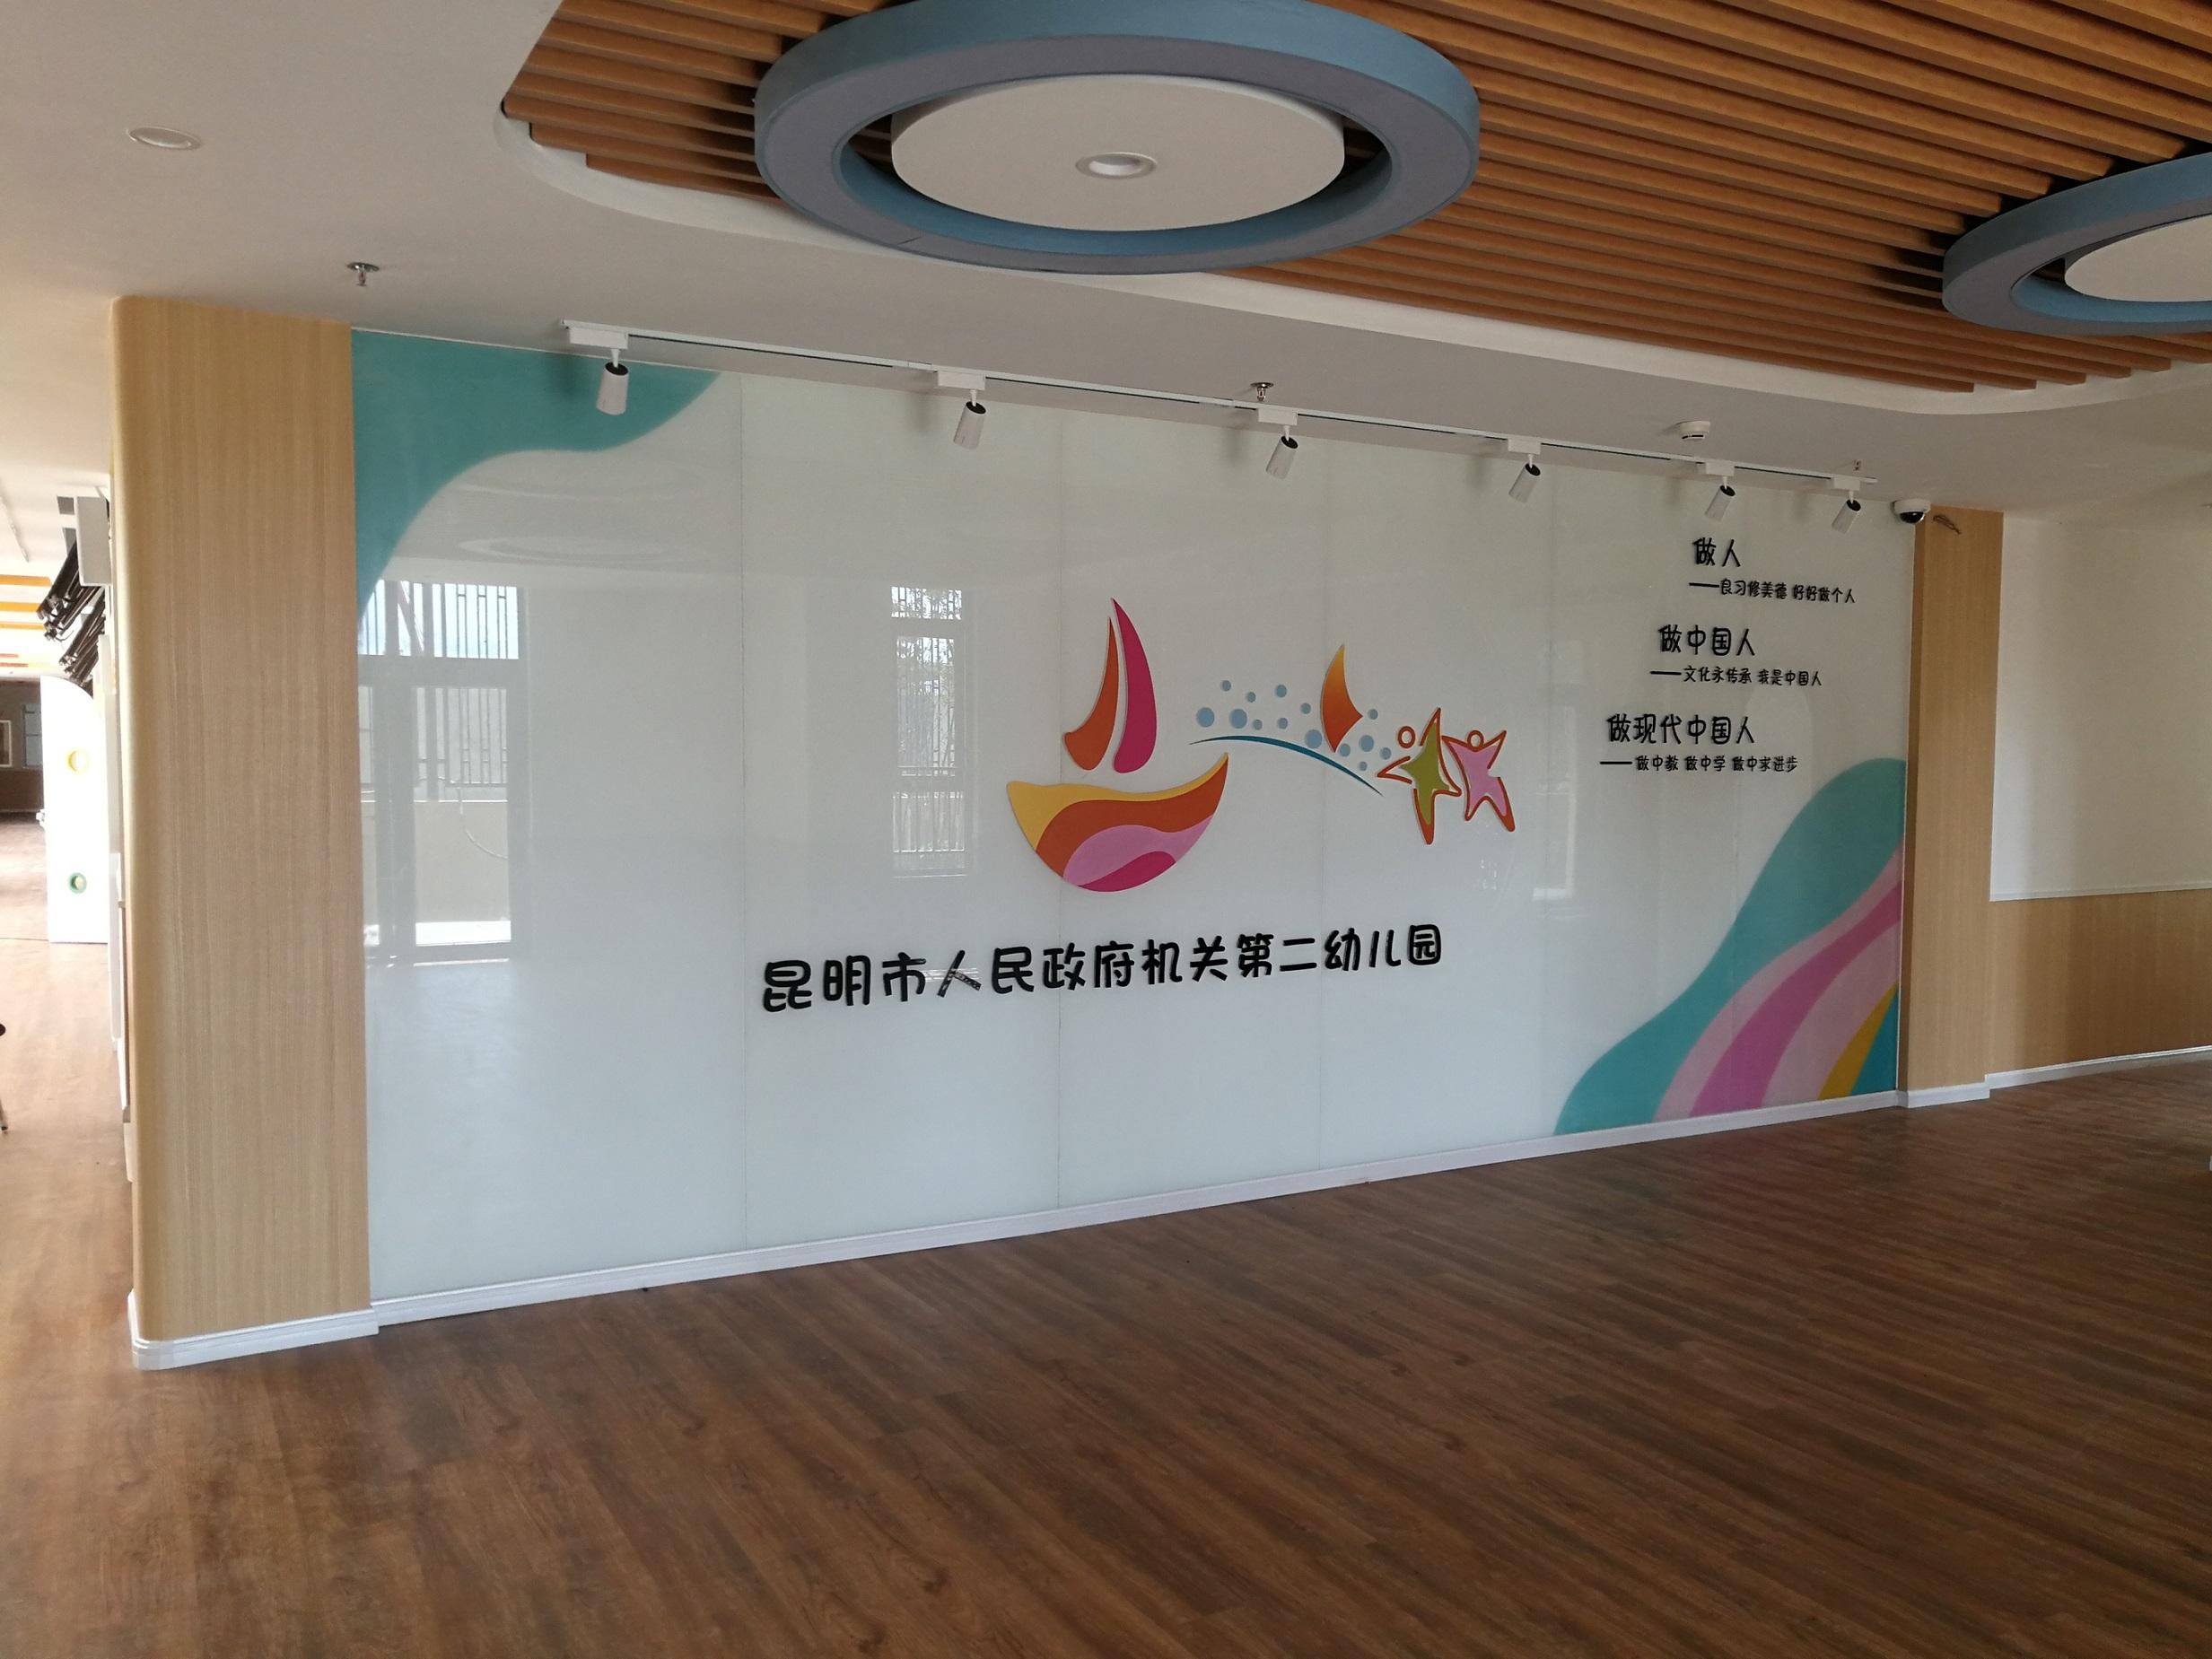 AG亚洲平台木业-万科幼儿园